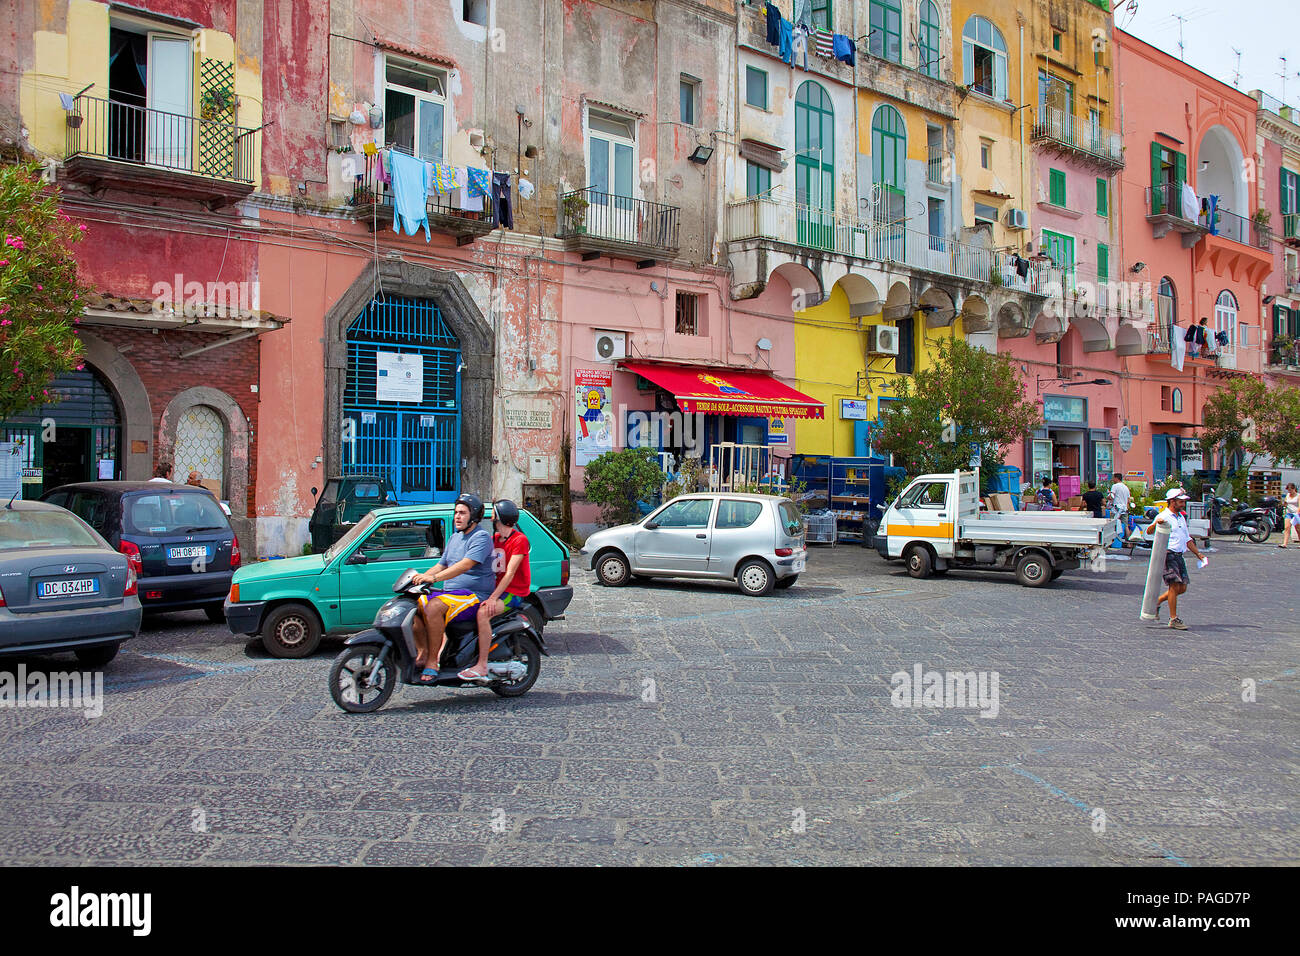 Colourful fishermen's houses at Marina Grande, Procida island, Gulf of Naples, Italy Stock Photo